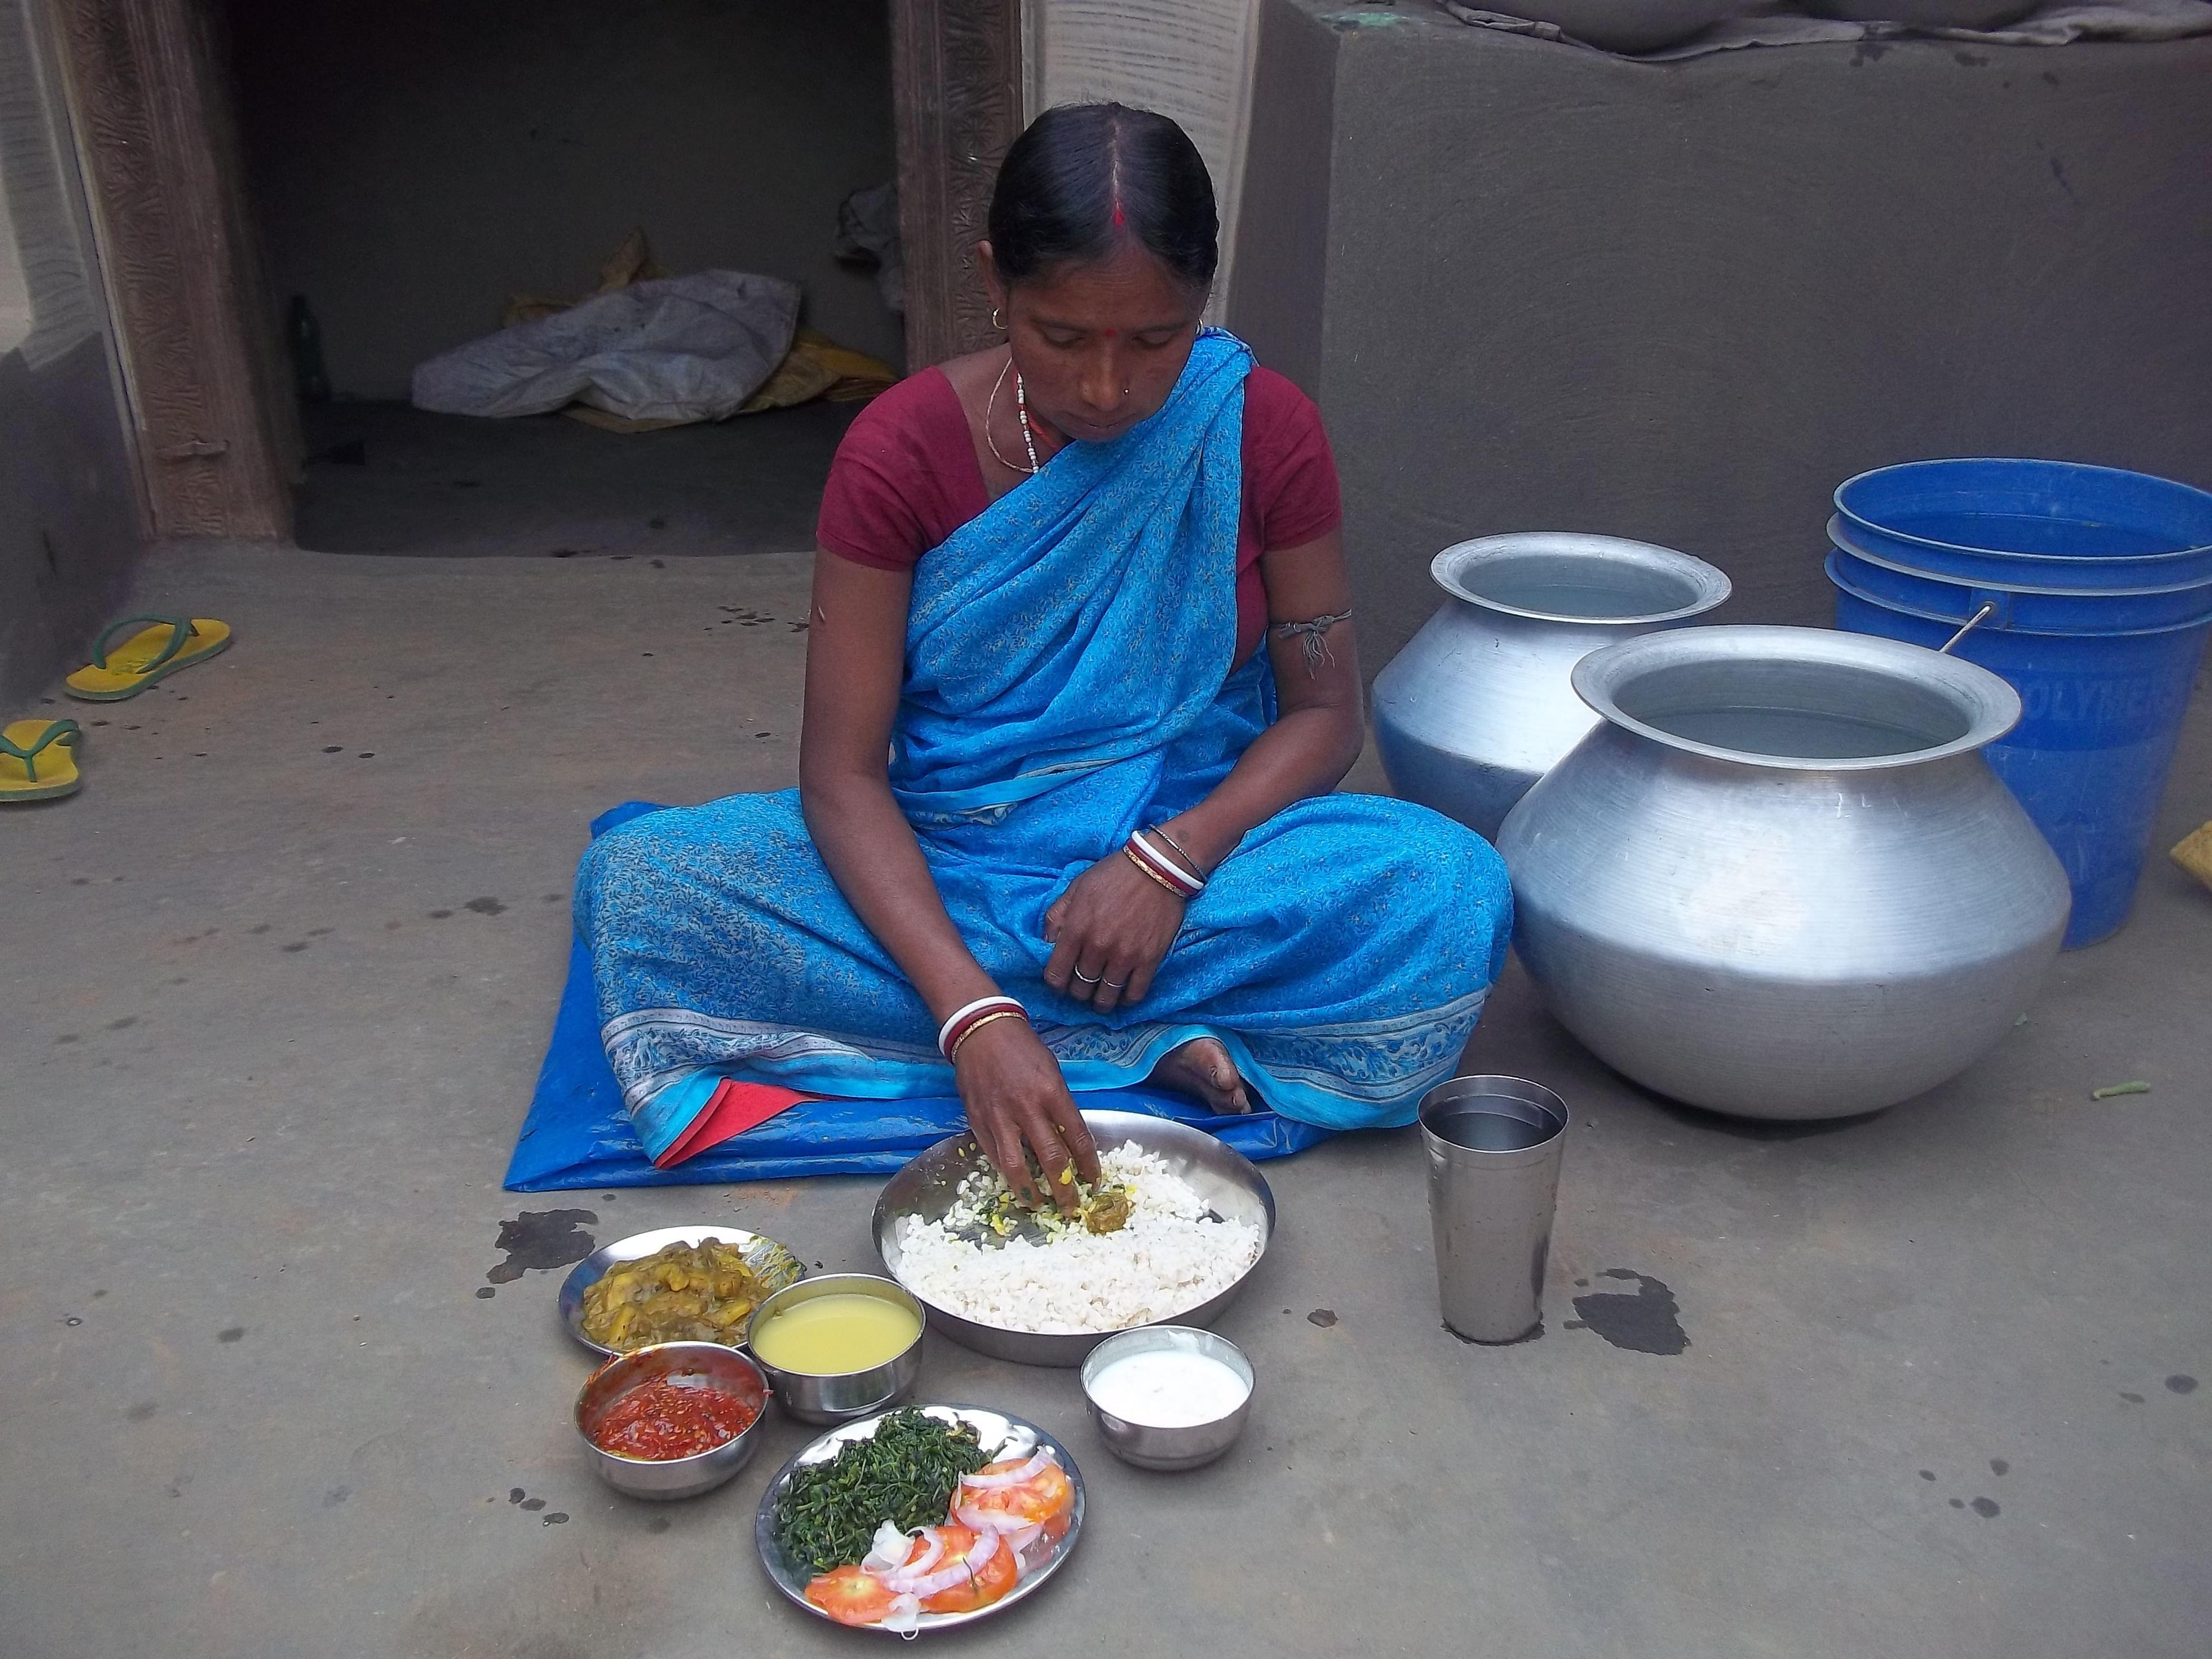 In Kasudih village, which is part of the Tatkiyo panchayat, Sheela Devi has taken to cooking 'tiranga bhojan' to ensure proper nutrition for the family. (Credit: Saadia Azim\WFS)